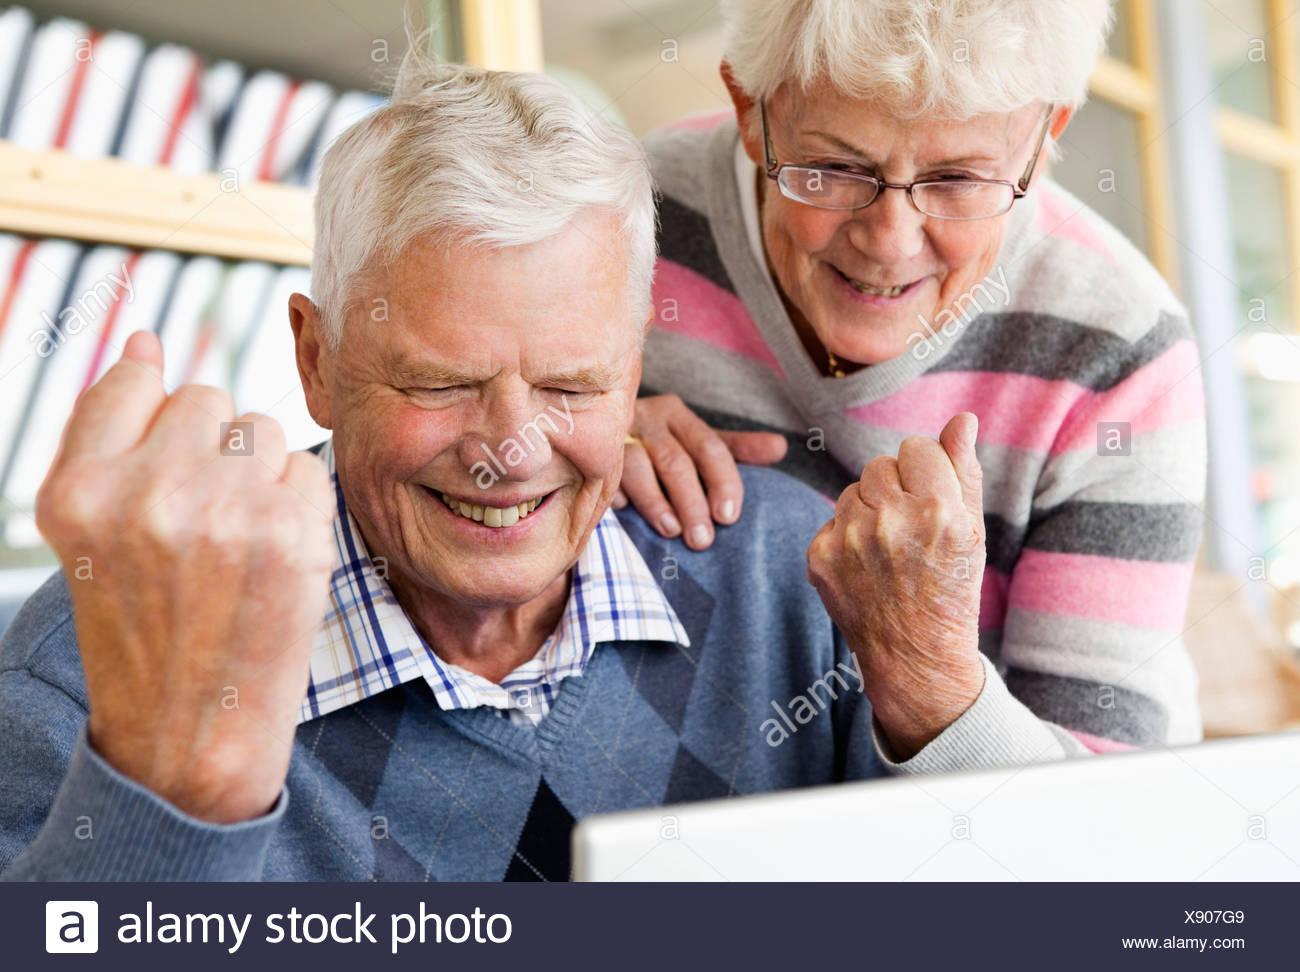 Elderly couple succeeding - Stock Image